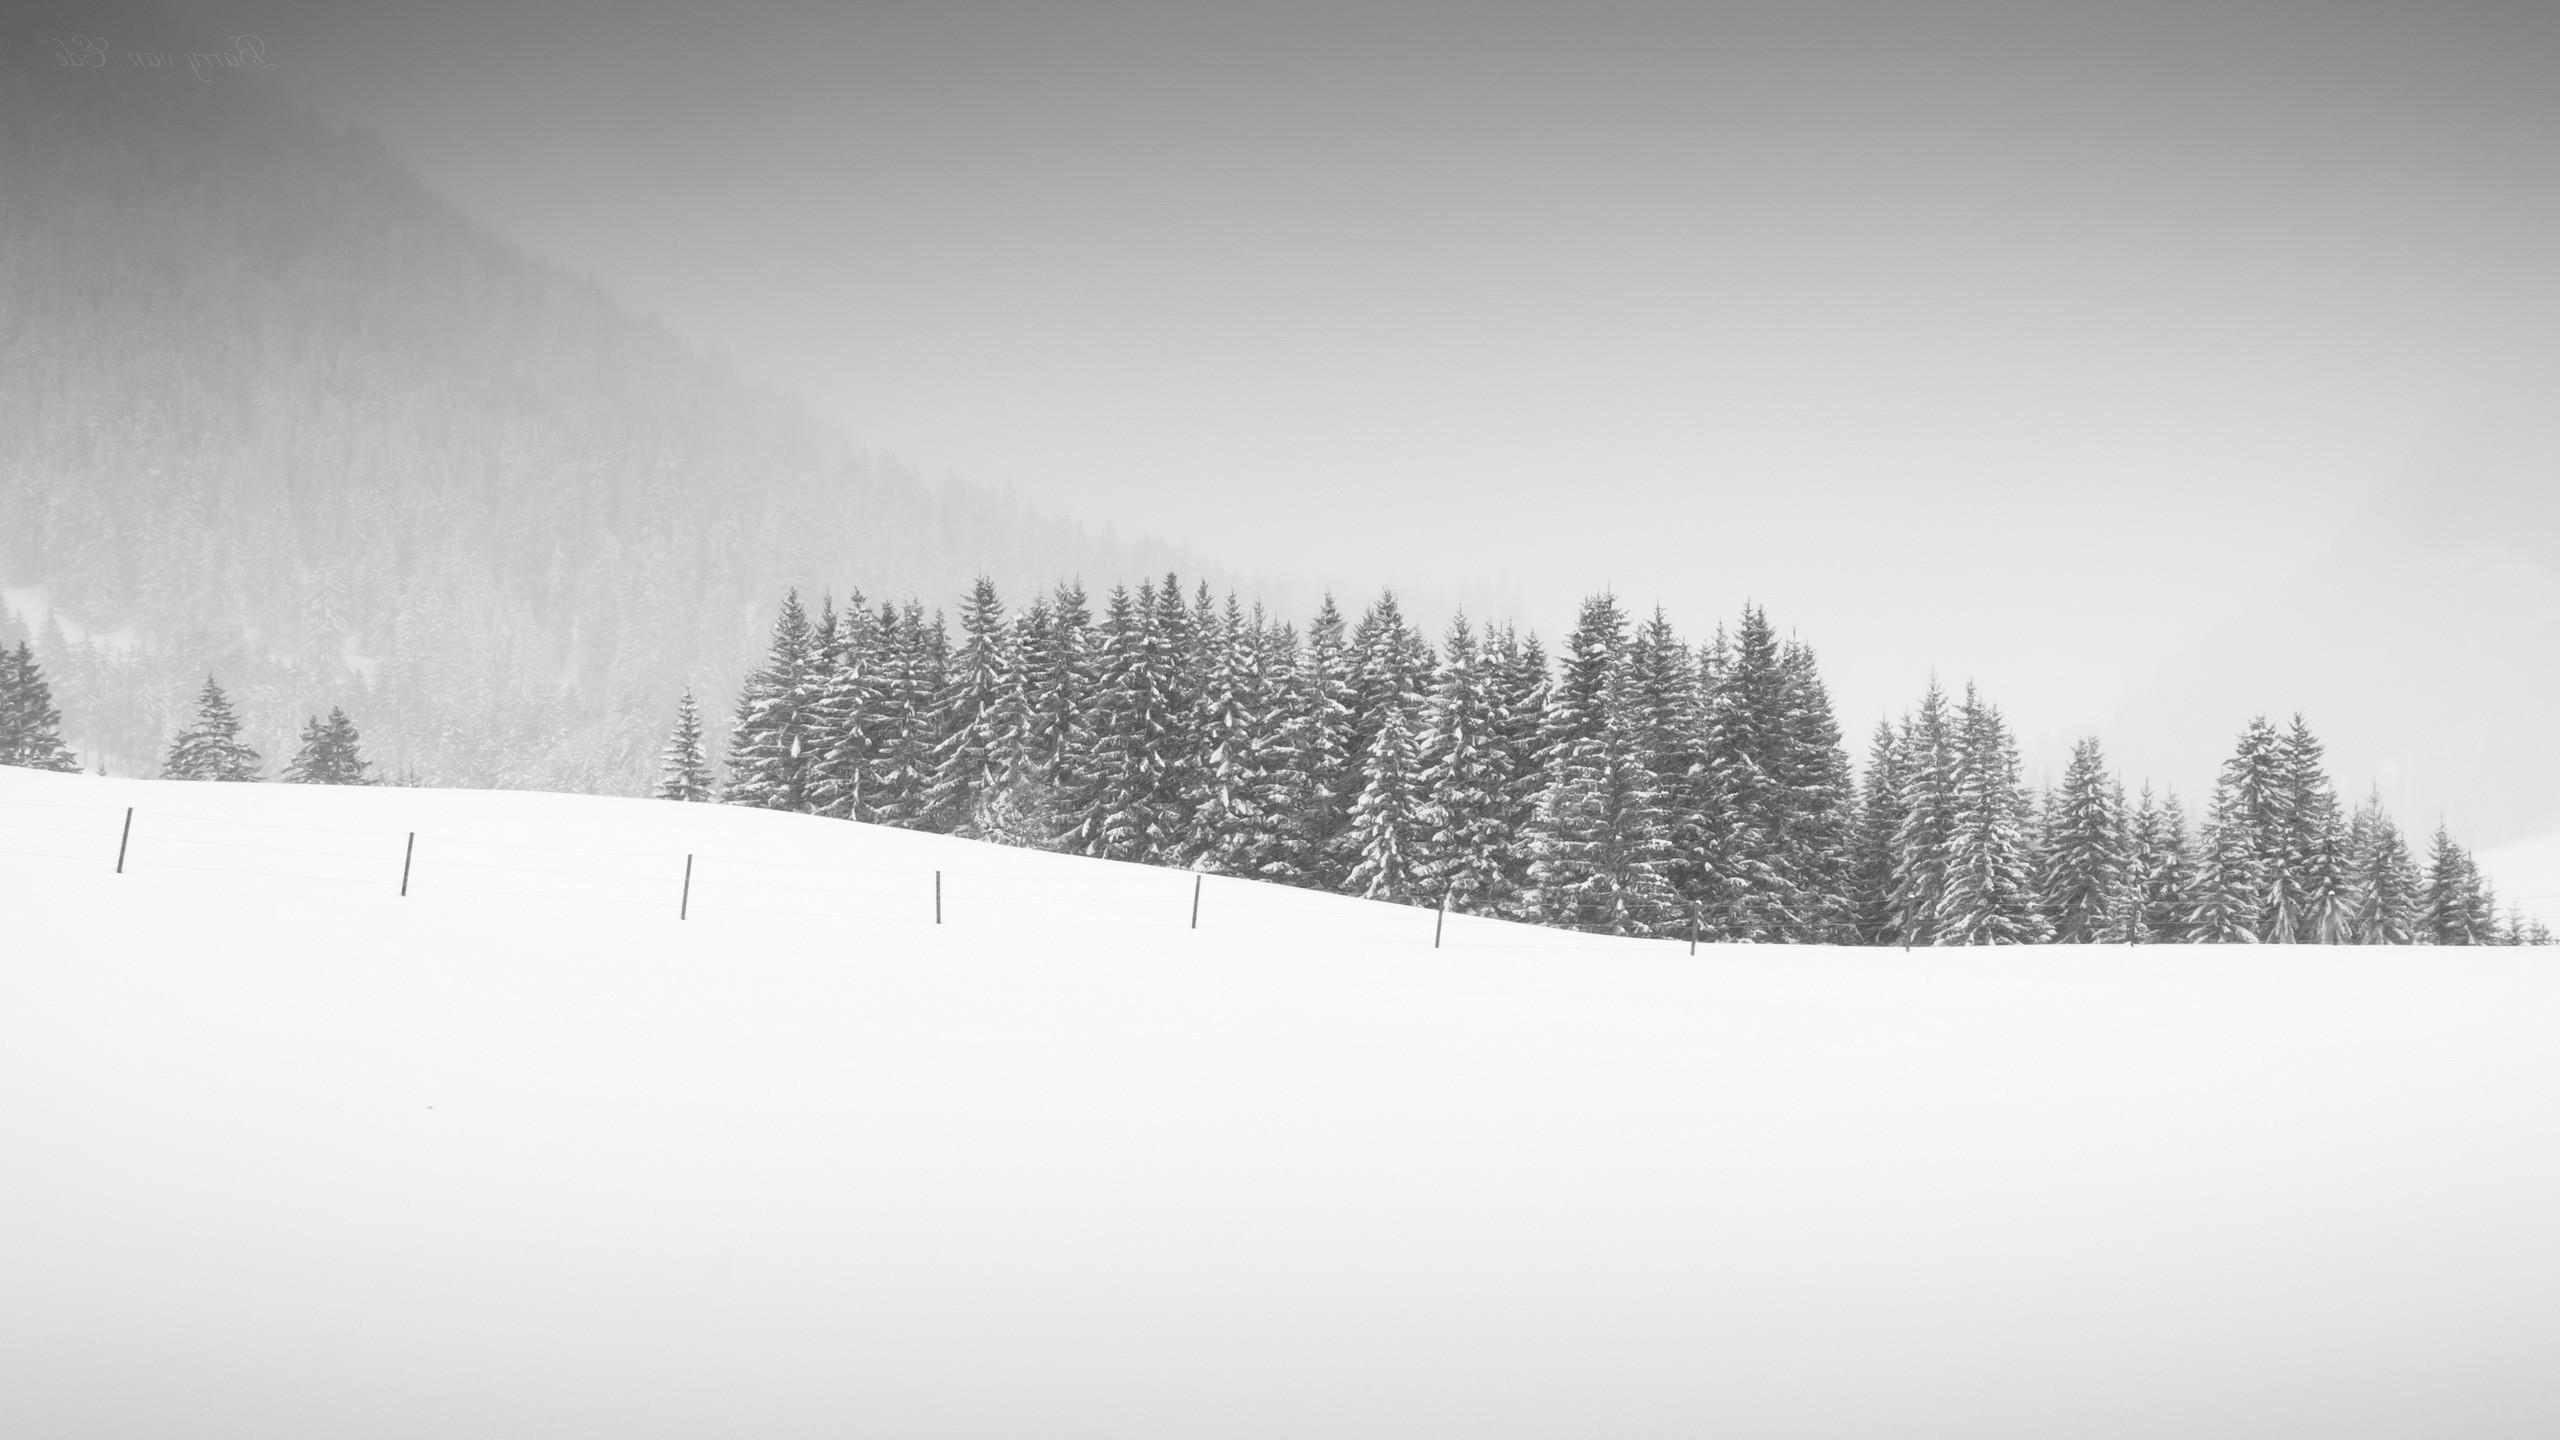 Fond Blanc 2560x1440